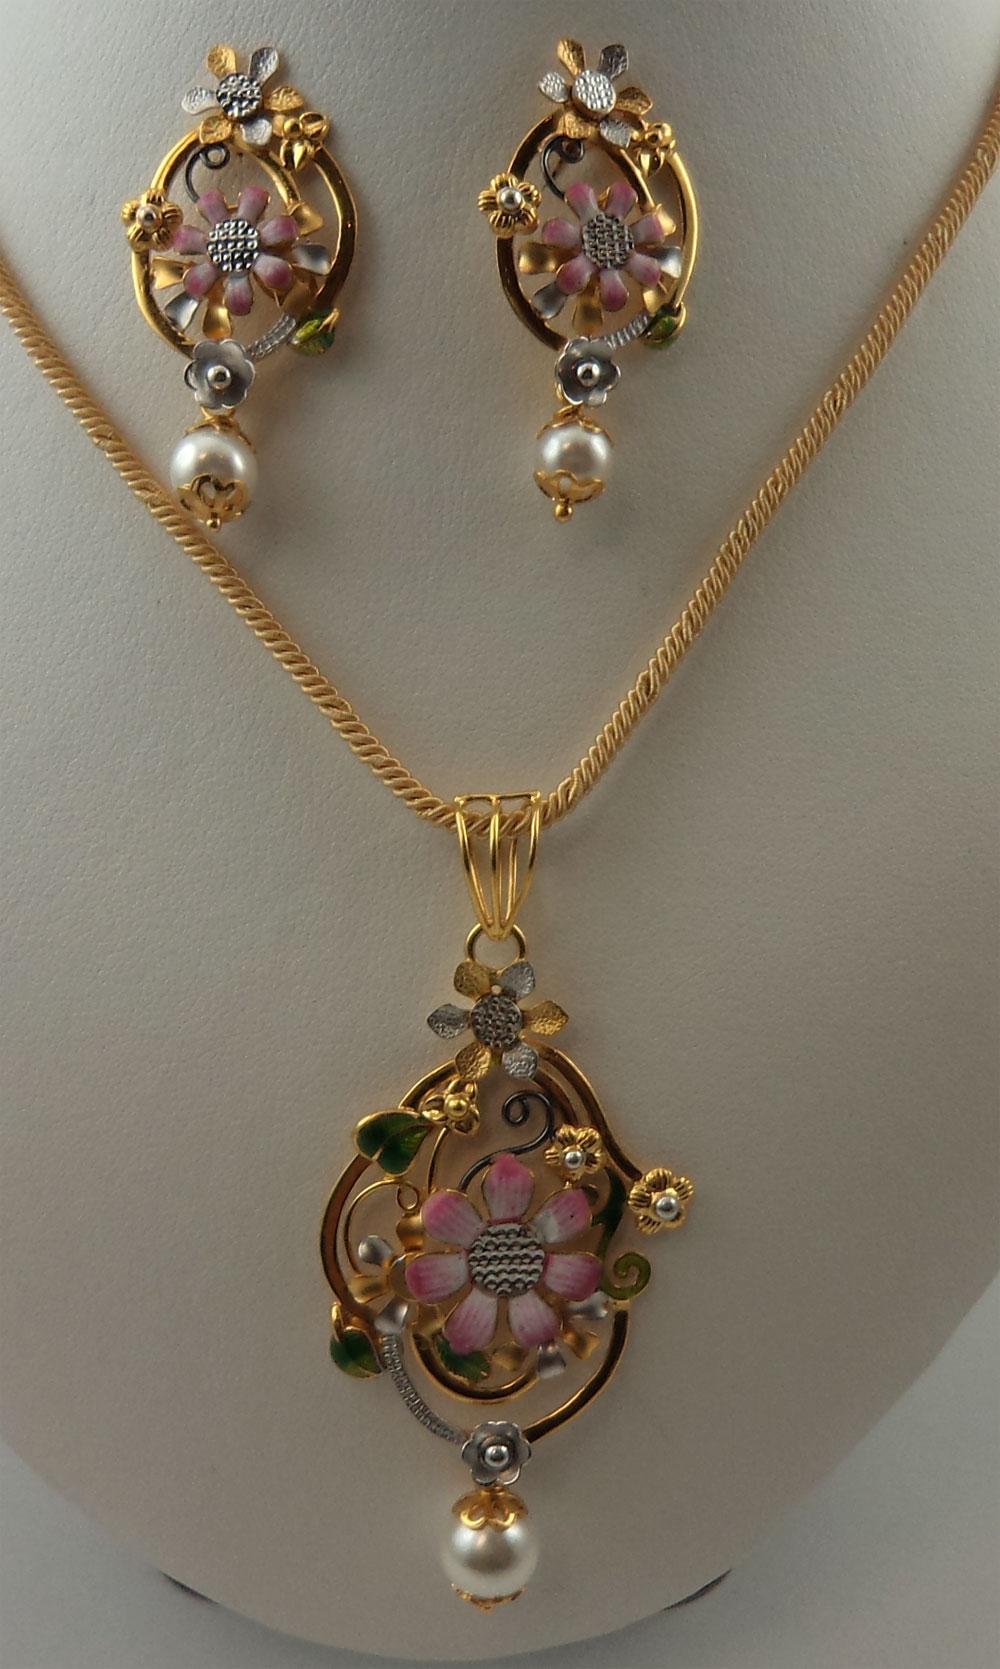 22karat Gold 2 Tone Fancy Flower Design Meenakari Pearl Hanging Pendant Set 22 Gold Jewellery Pendants Lotus Gold